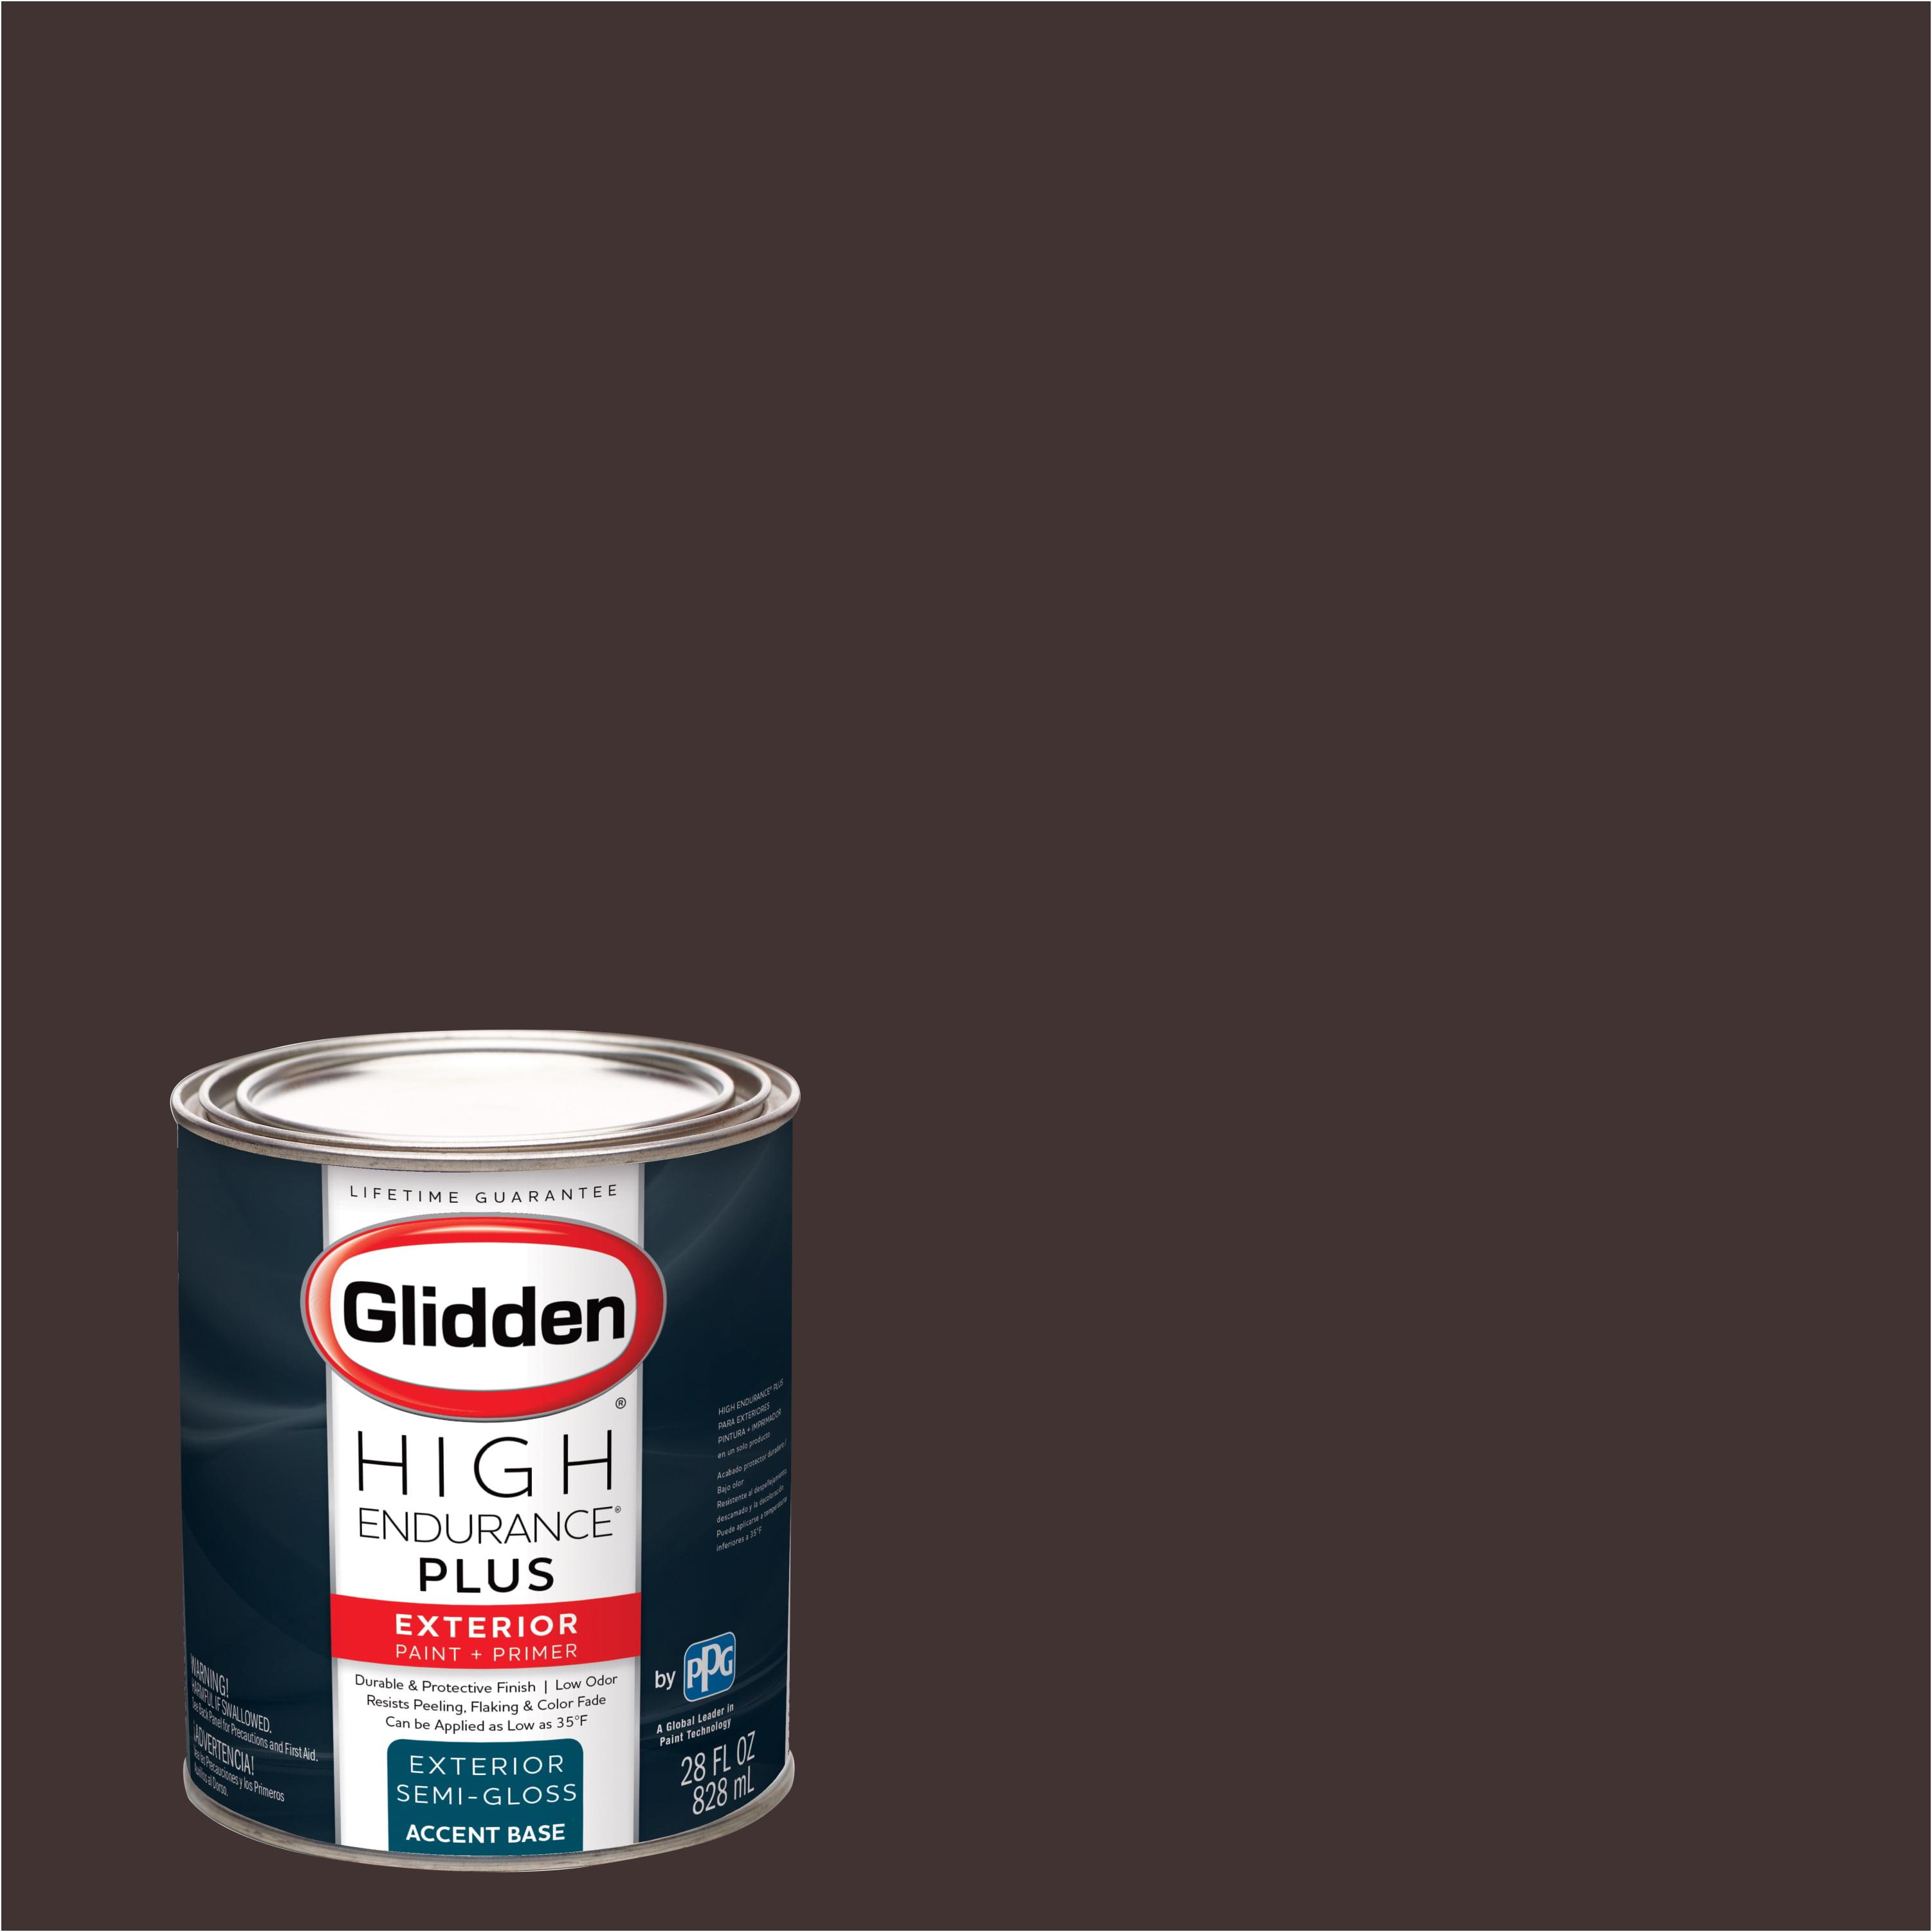 Glidden High Endurance Plus Exterior Paint and Primer, Ranch House Brown, #85RR 05/082